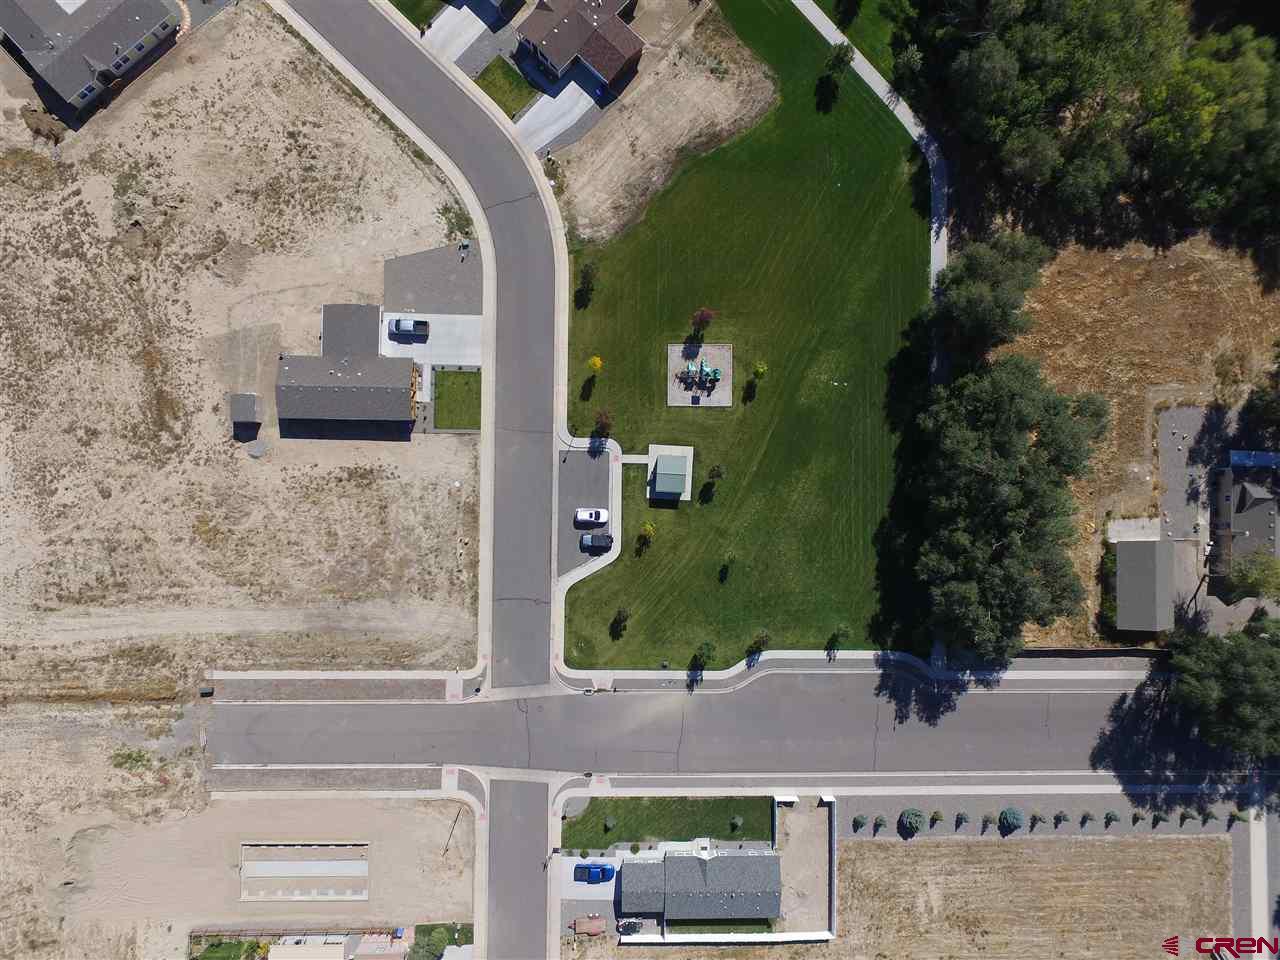 Lot 108 Sunlight Court, Montrose, Colorado 81401, ,Lots And Land,For Sale,Lot 108 Sunlight Court,742190